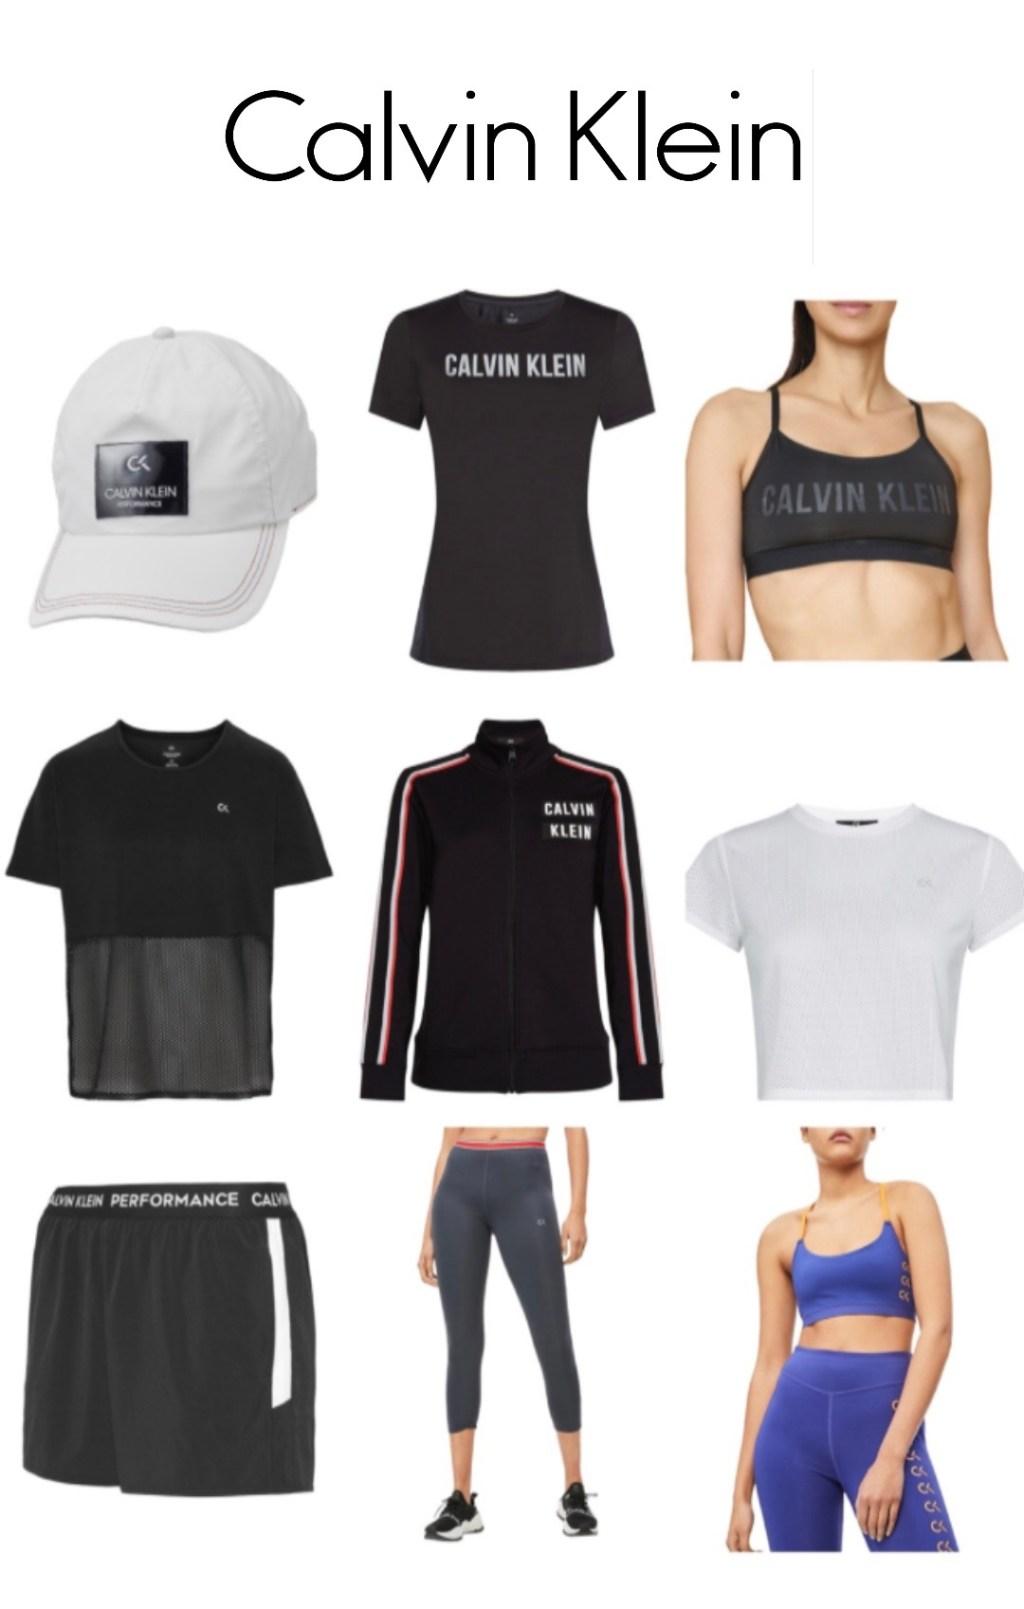 Calvin Klein activewear